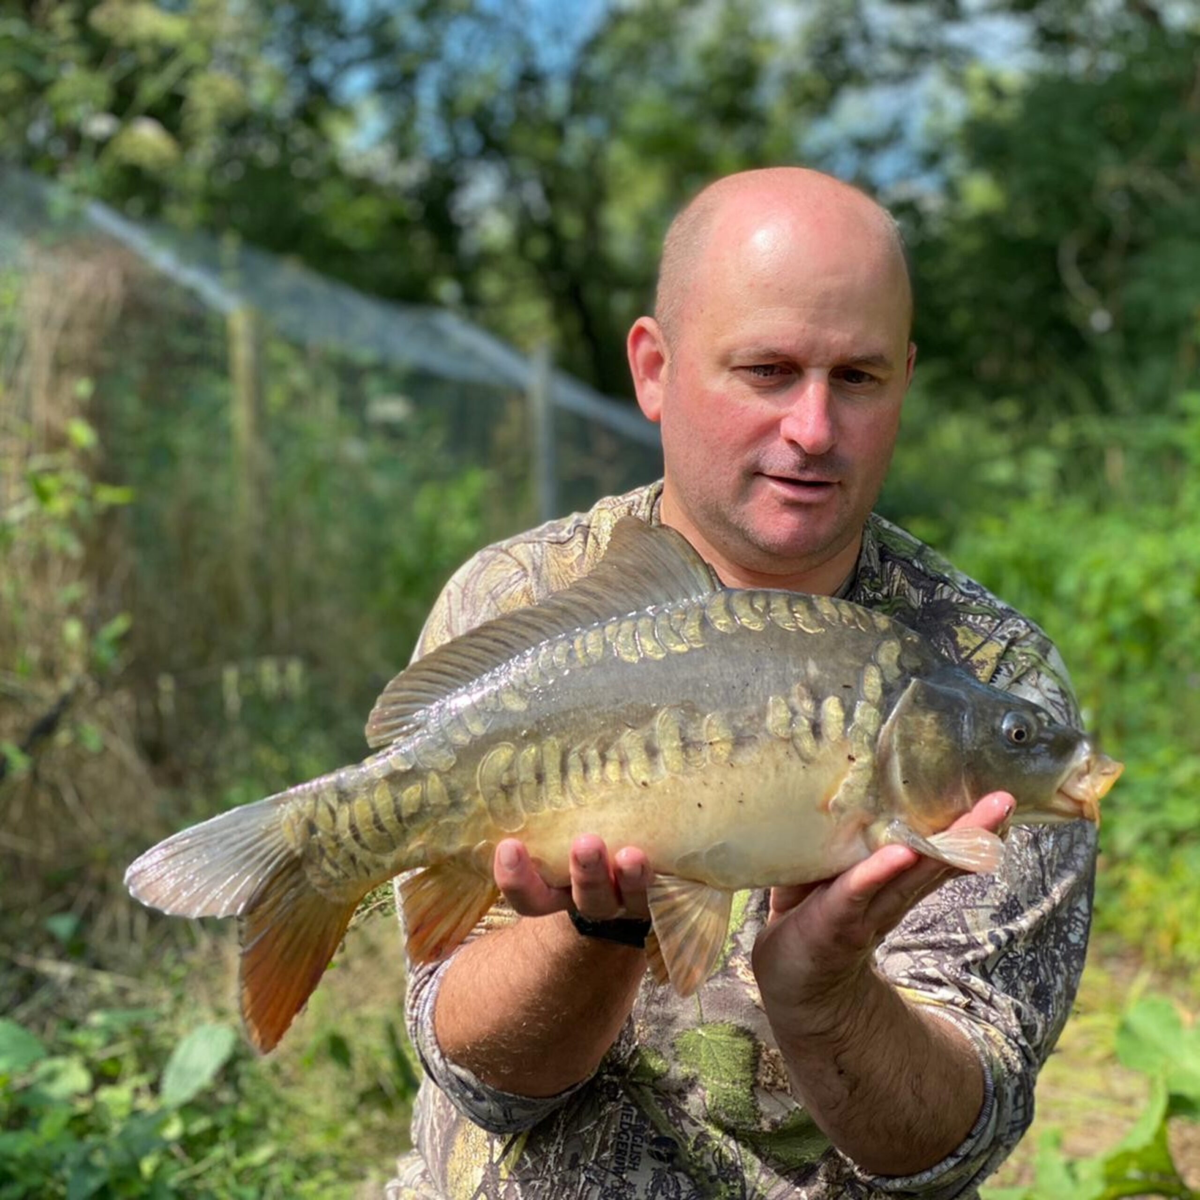 Quest Fishing Adventures - Carp Pike Barbel Chub Perch Bream Roach Gotta Catch Them All 23: Legends Lake 006 / Carp Fishing